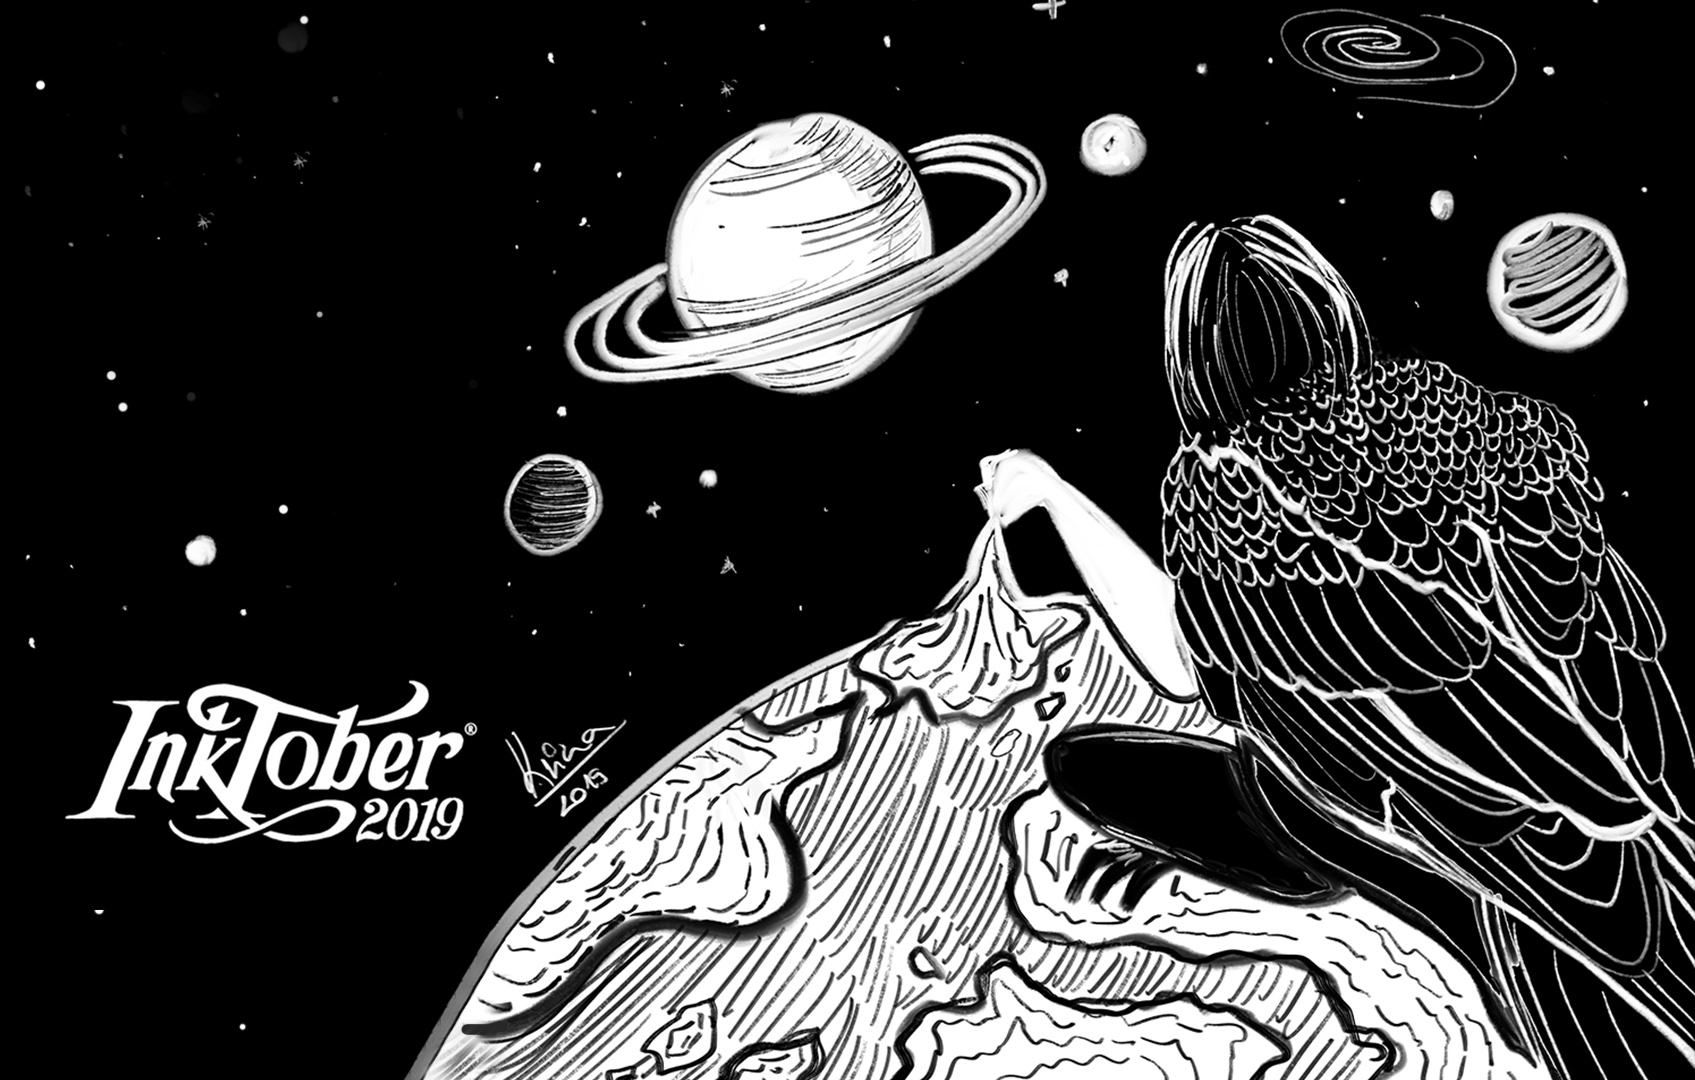 inktober-2019-illusztraciok-gallaynagykrisztina